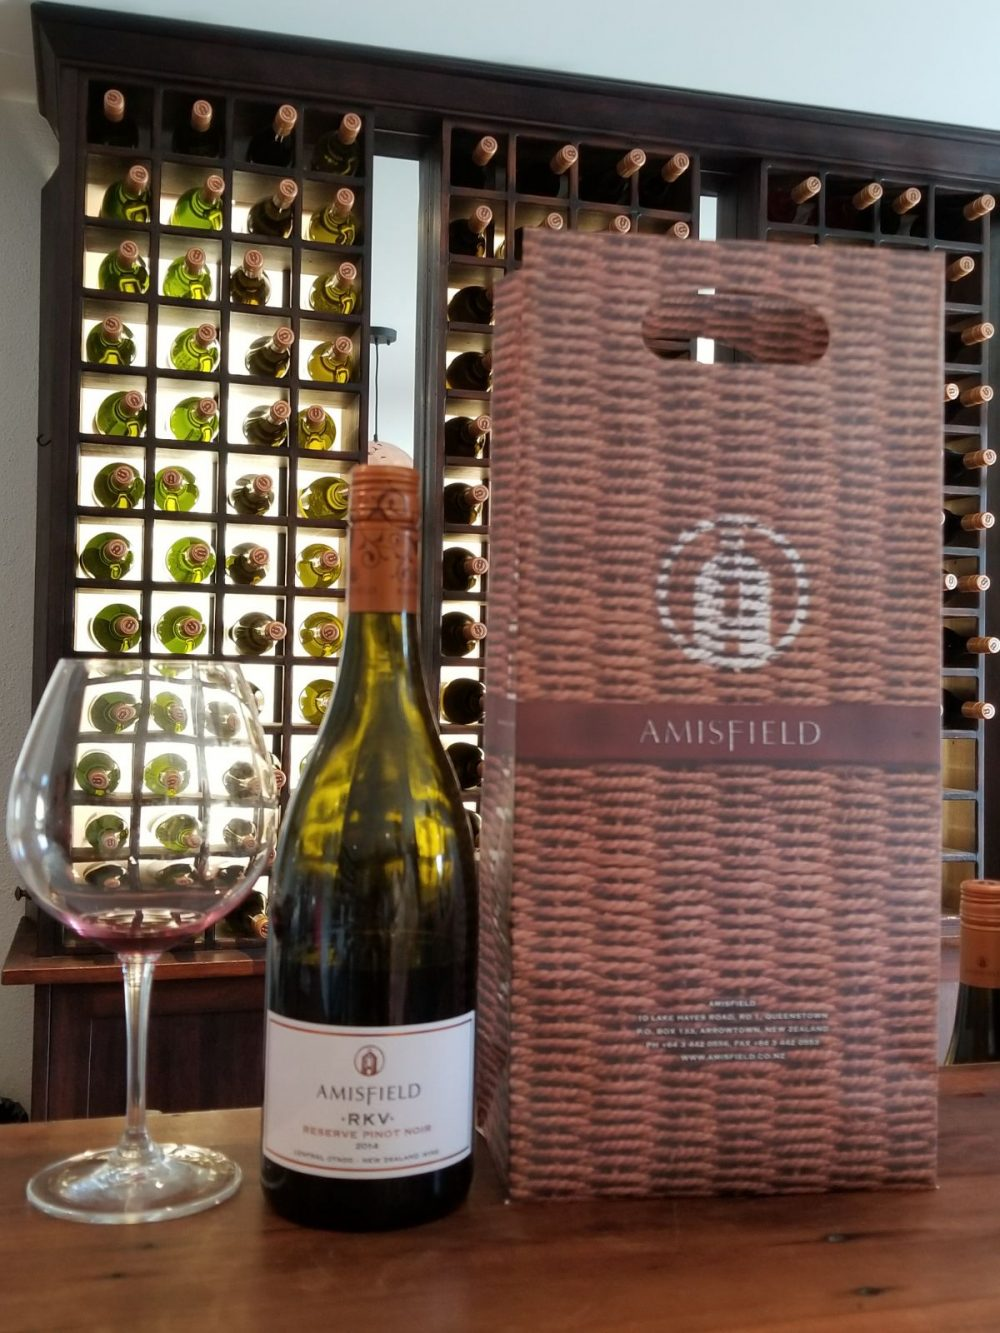 Amisfield RKV Reserve Pinot Noir 2014